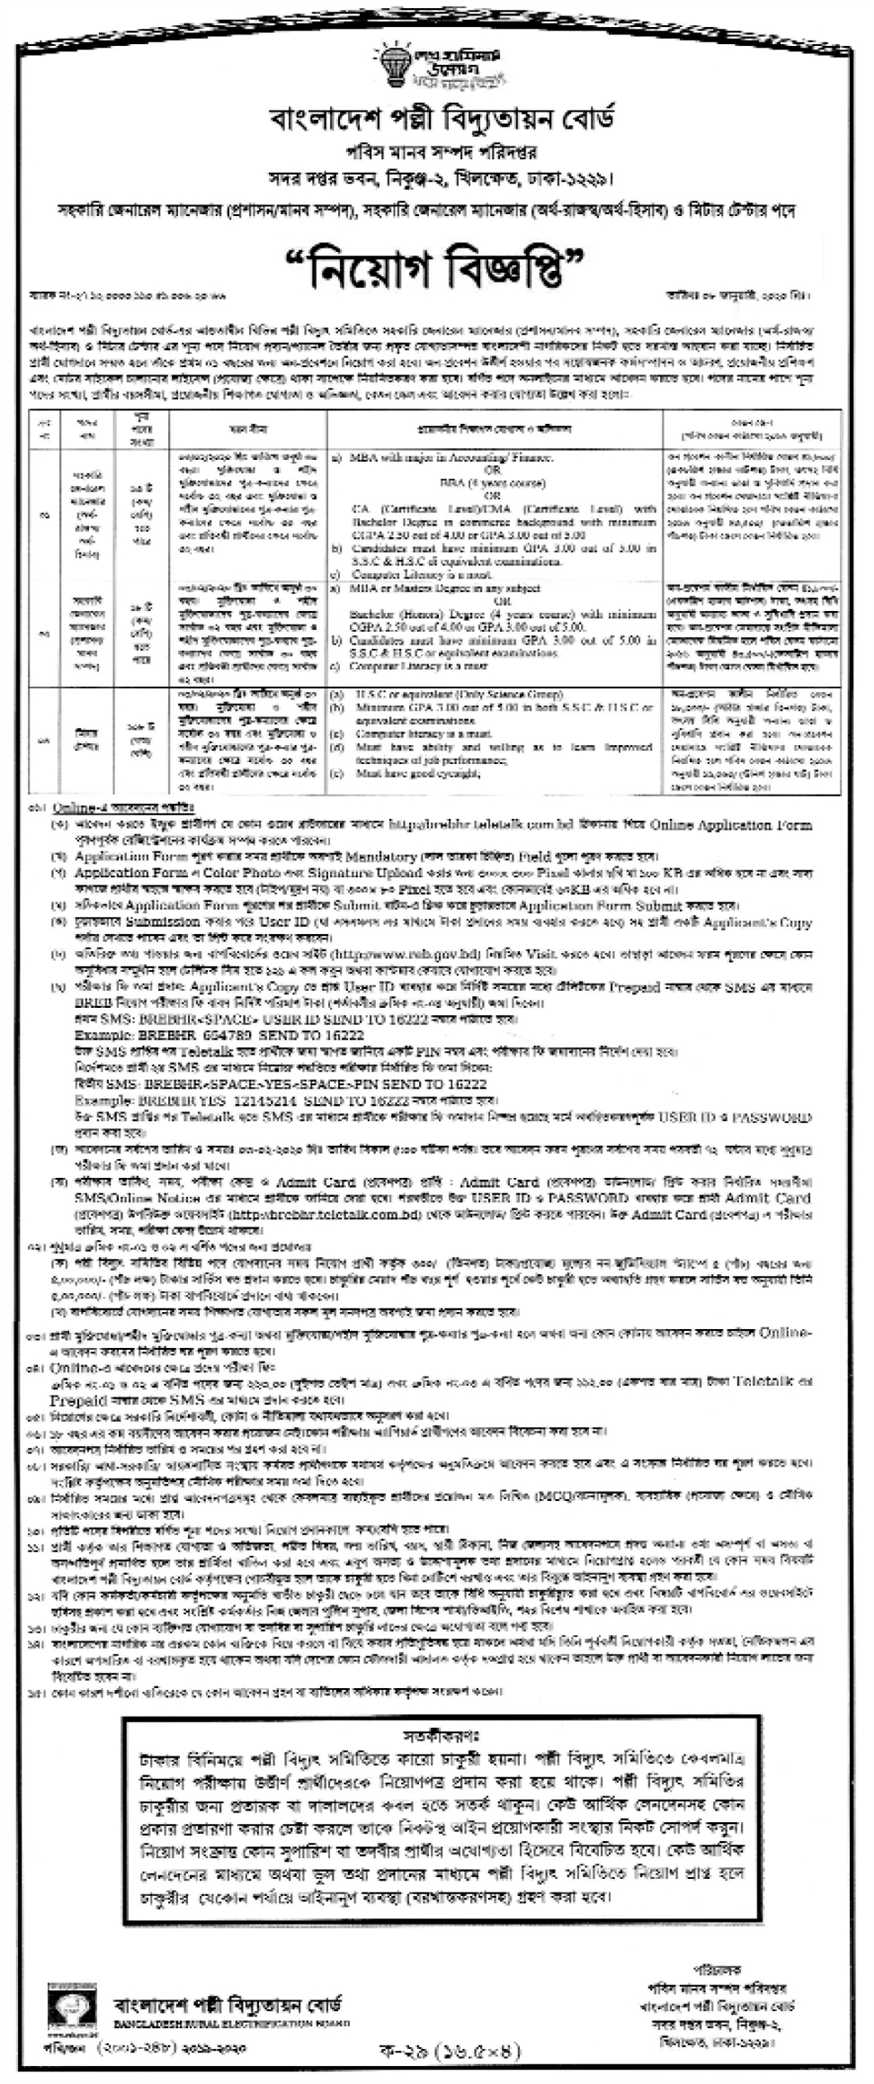 BREB Job Circular -breb gov bd